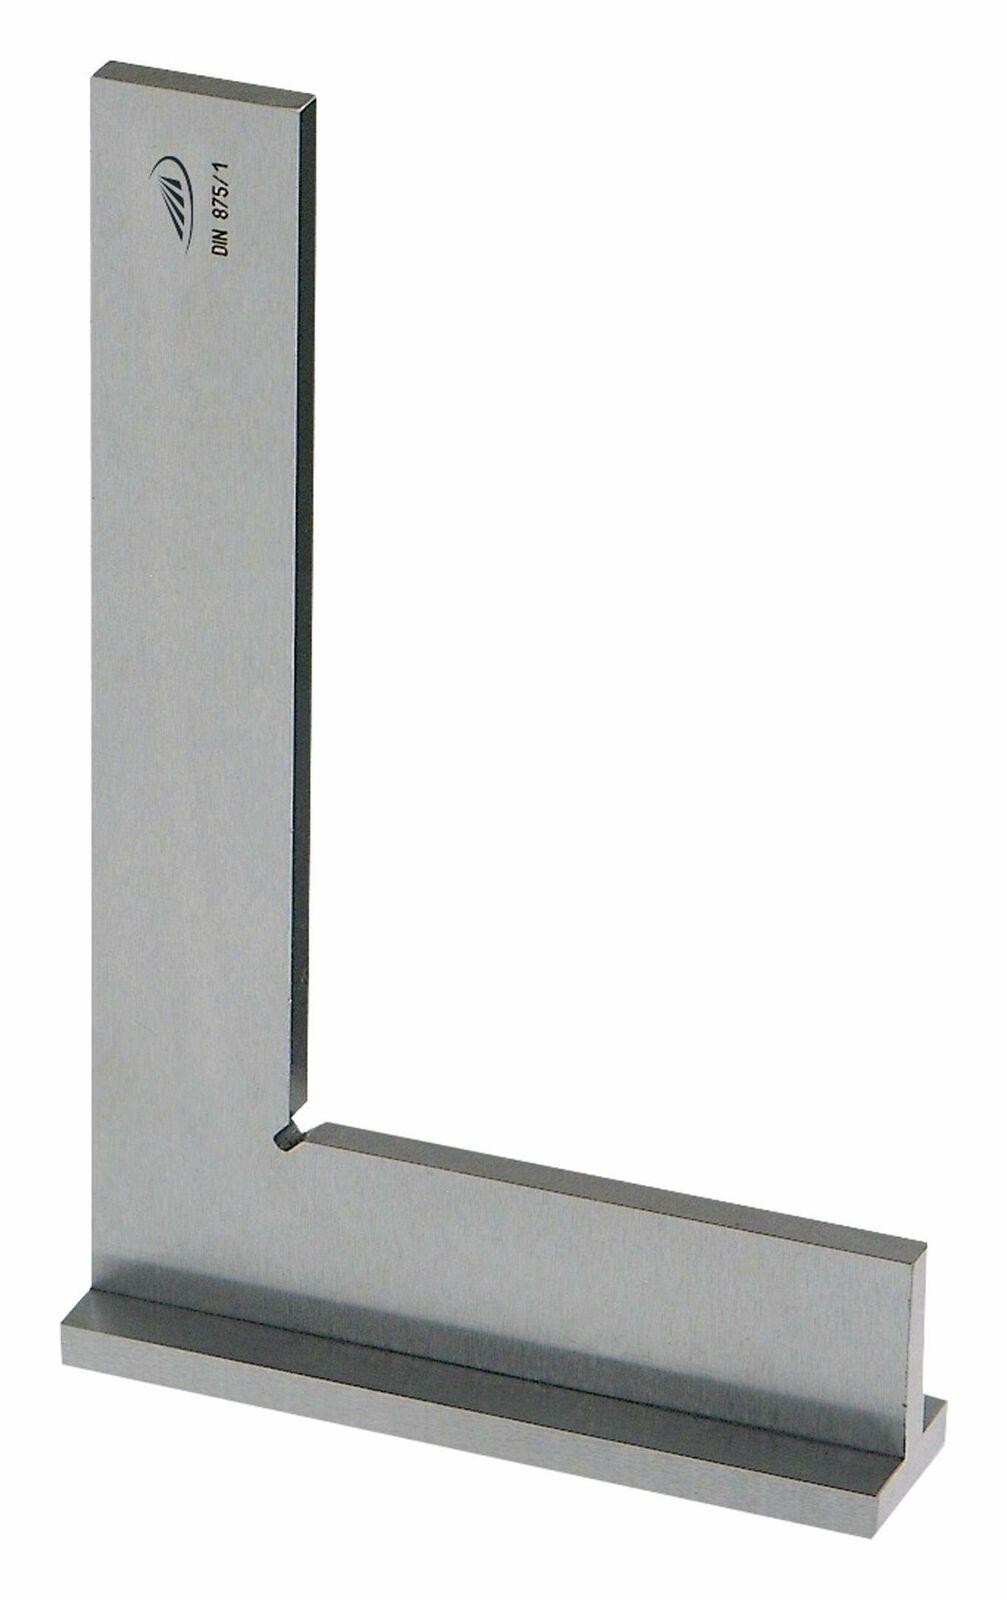 Helios Preisser Anschlagwinkel D875 0 B 250 x 165mm rostfei - 0368206